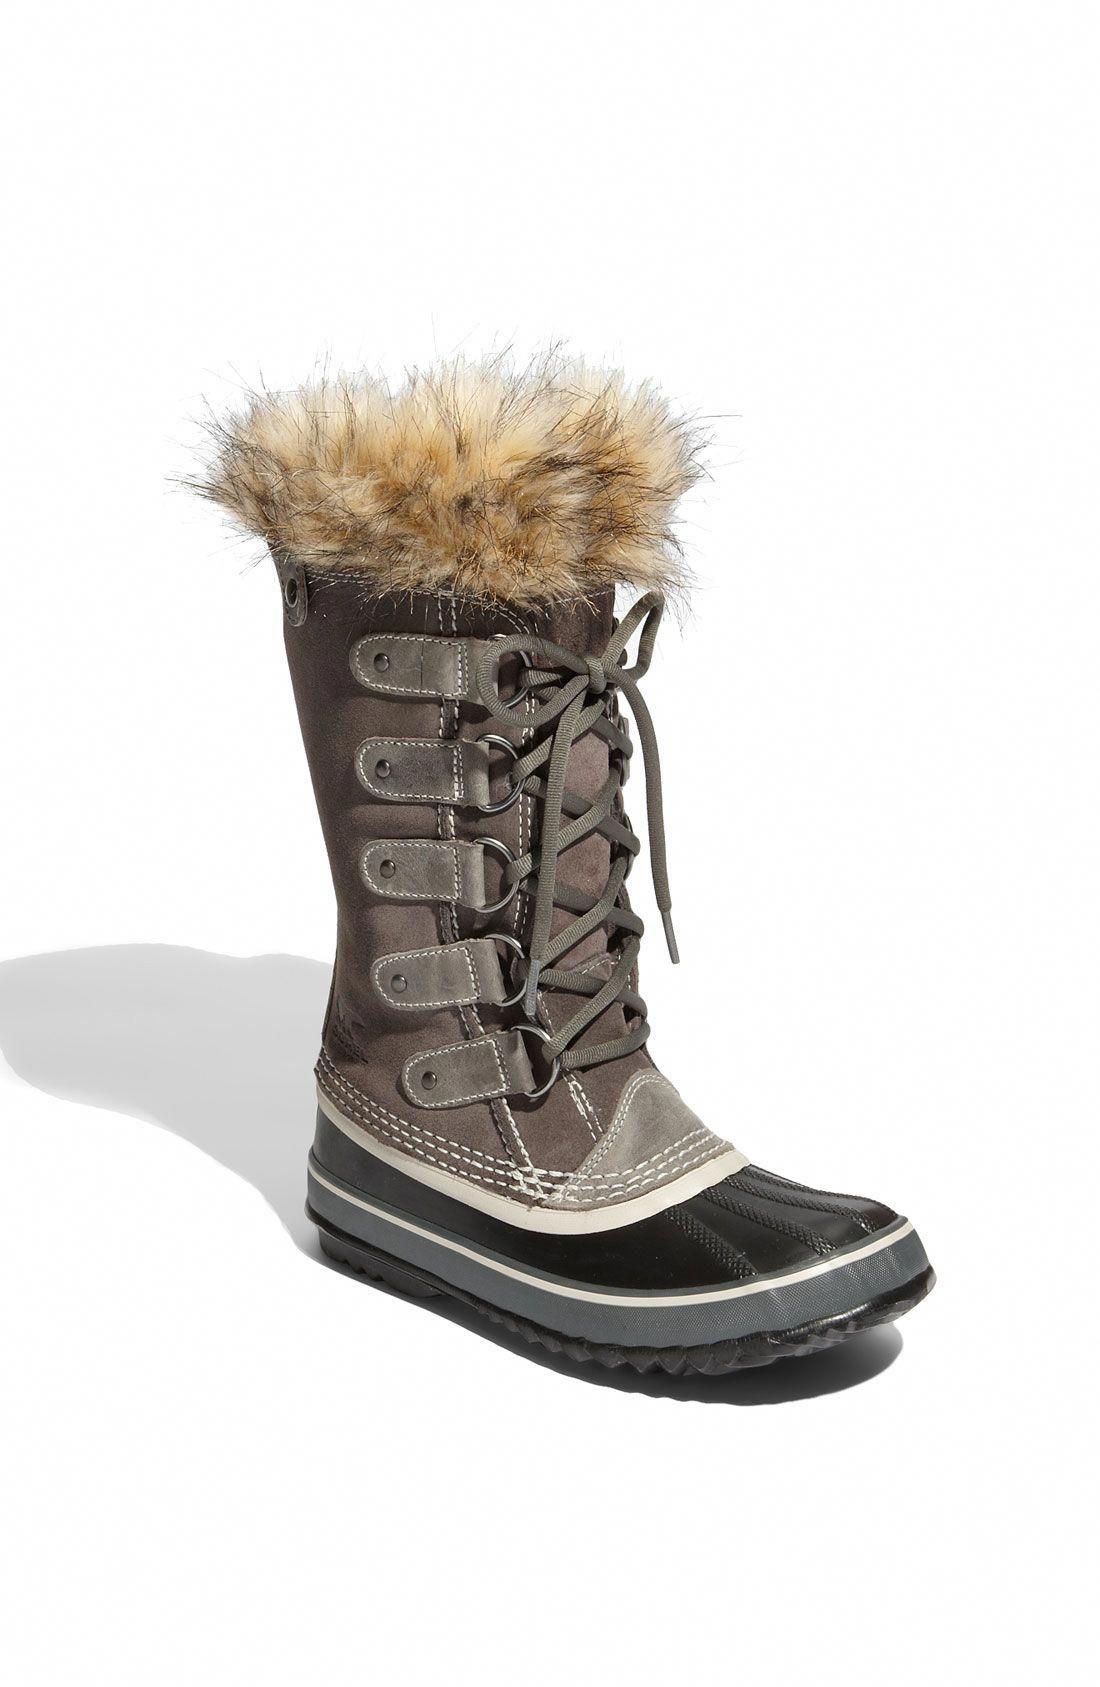 354f43e1b SOREL 'Joan of Arctic' Waterproof Snow Boot #snowboots   snow boots ...